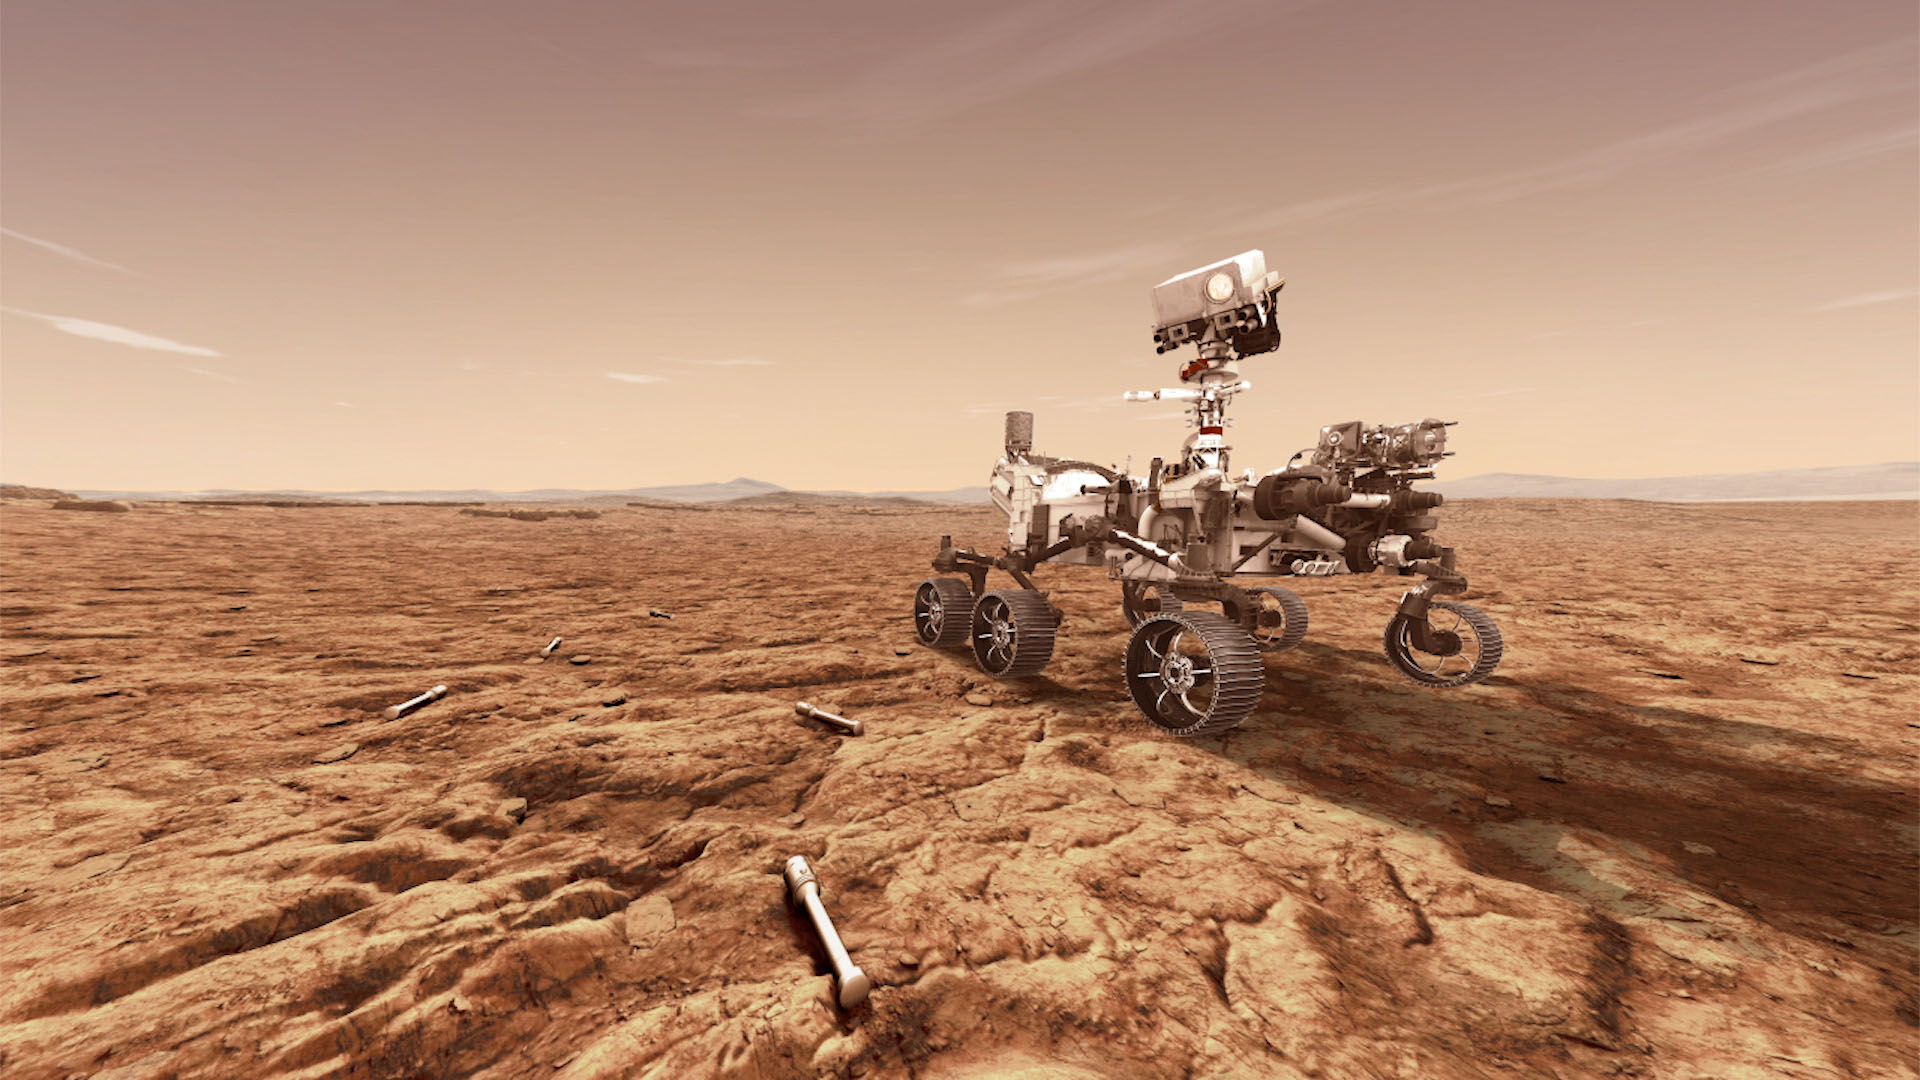 Марсоход NASA начинает поиски признаков жизни на Марсе